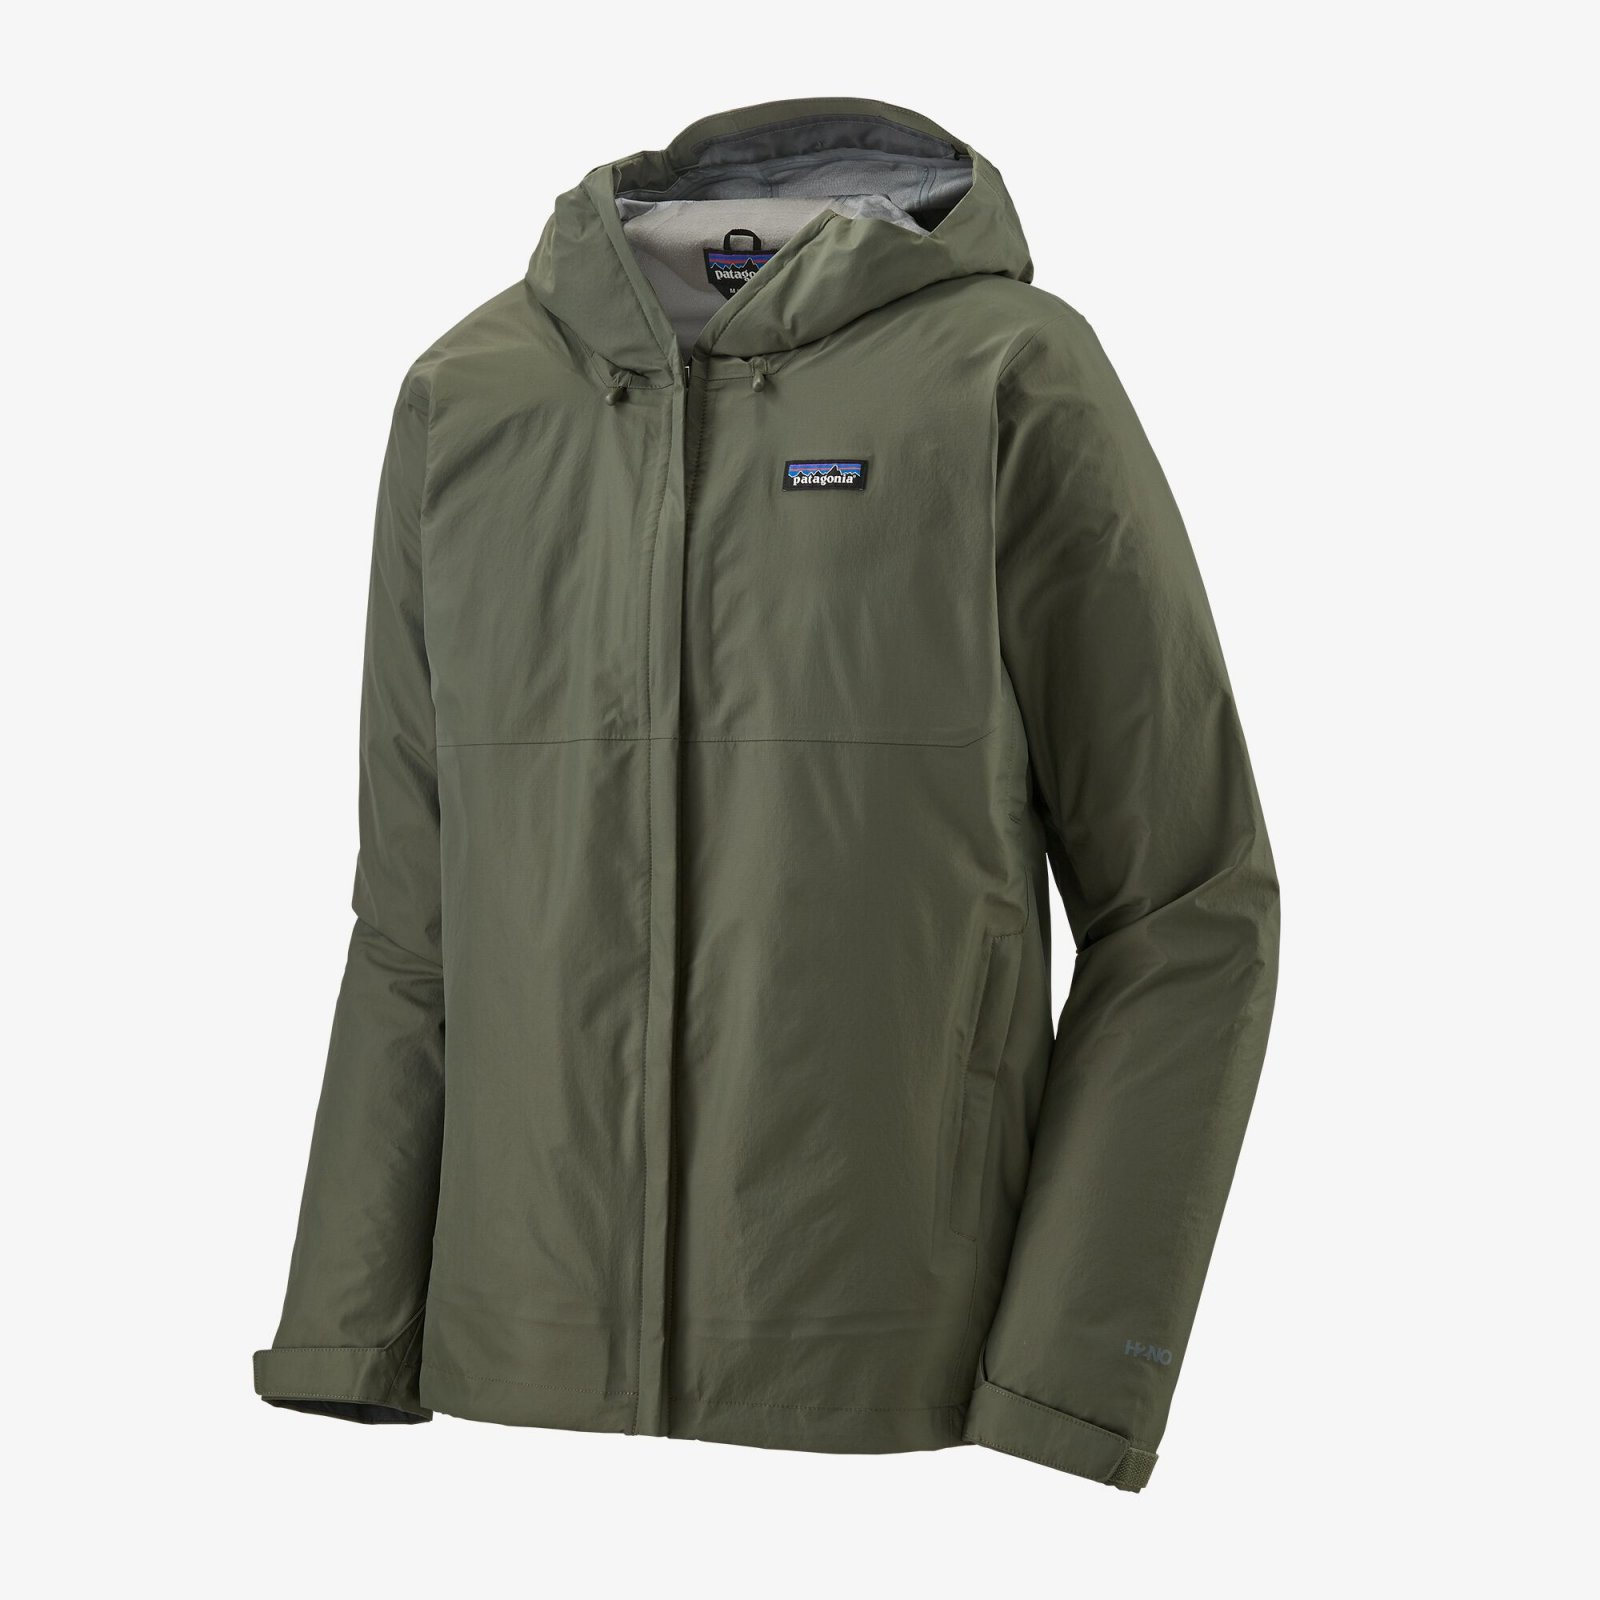 Men's Patagonia Torrentshell Jacket 85240 Industrial Green